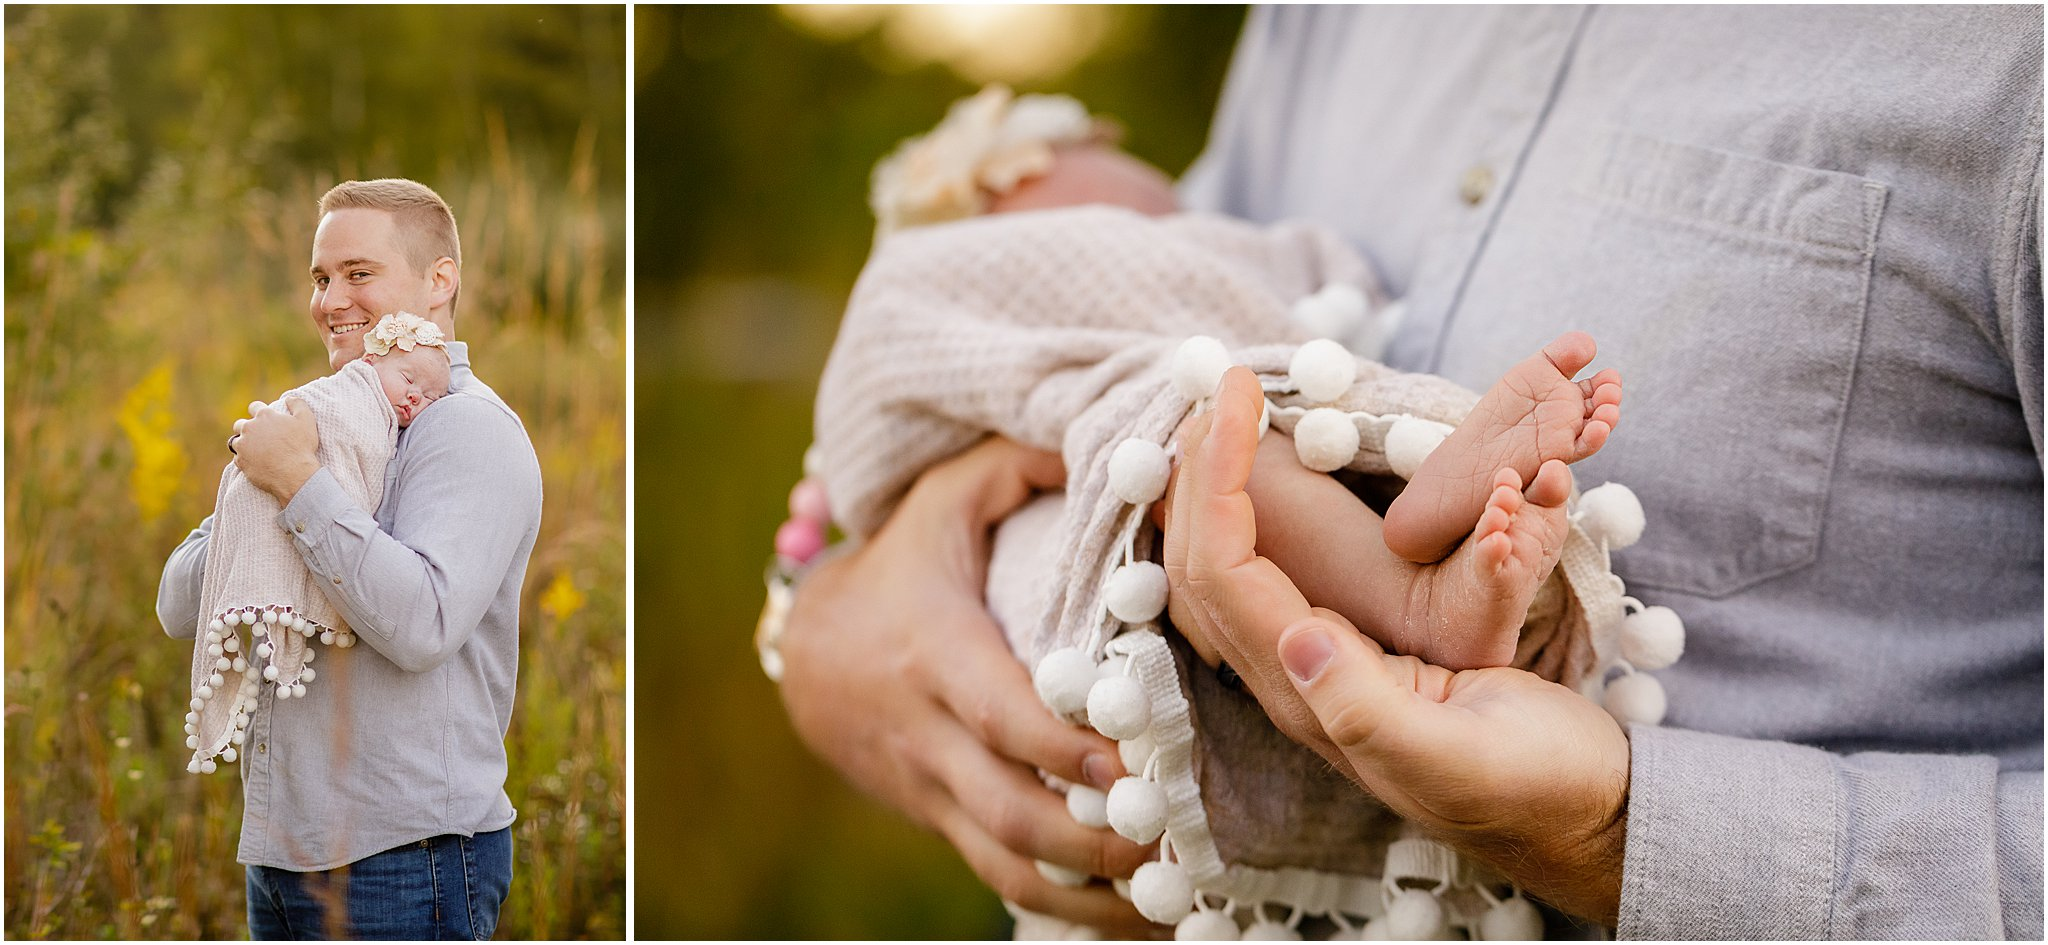 Ann Arbor Outdoor Newborn Photographer | Dexter, Mi